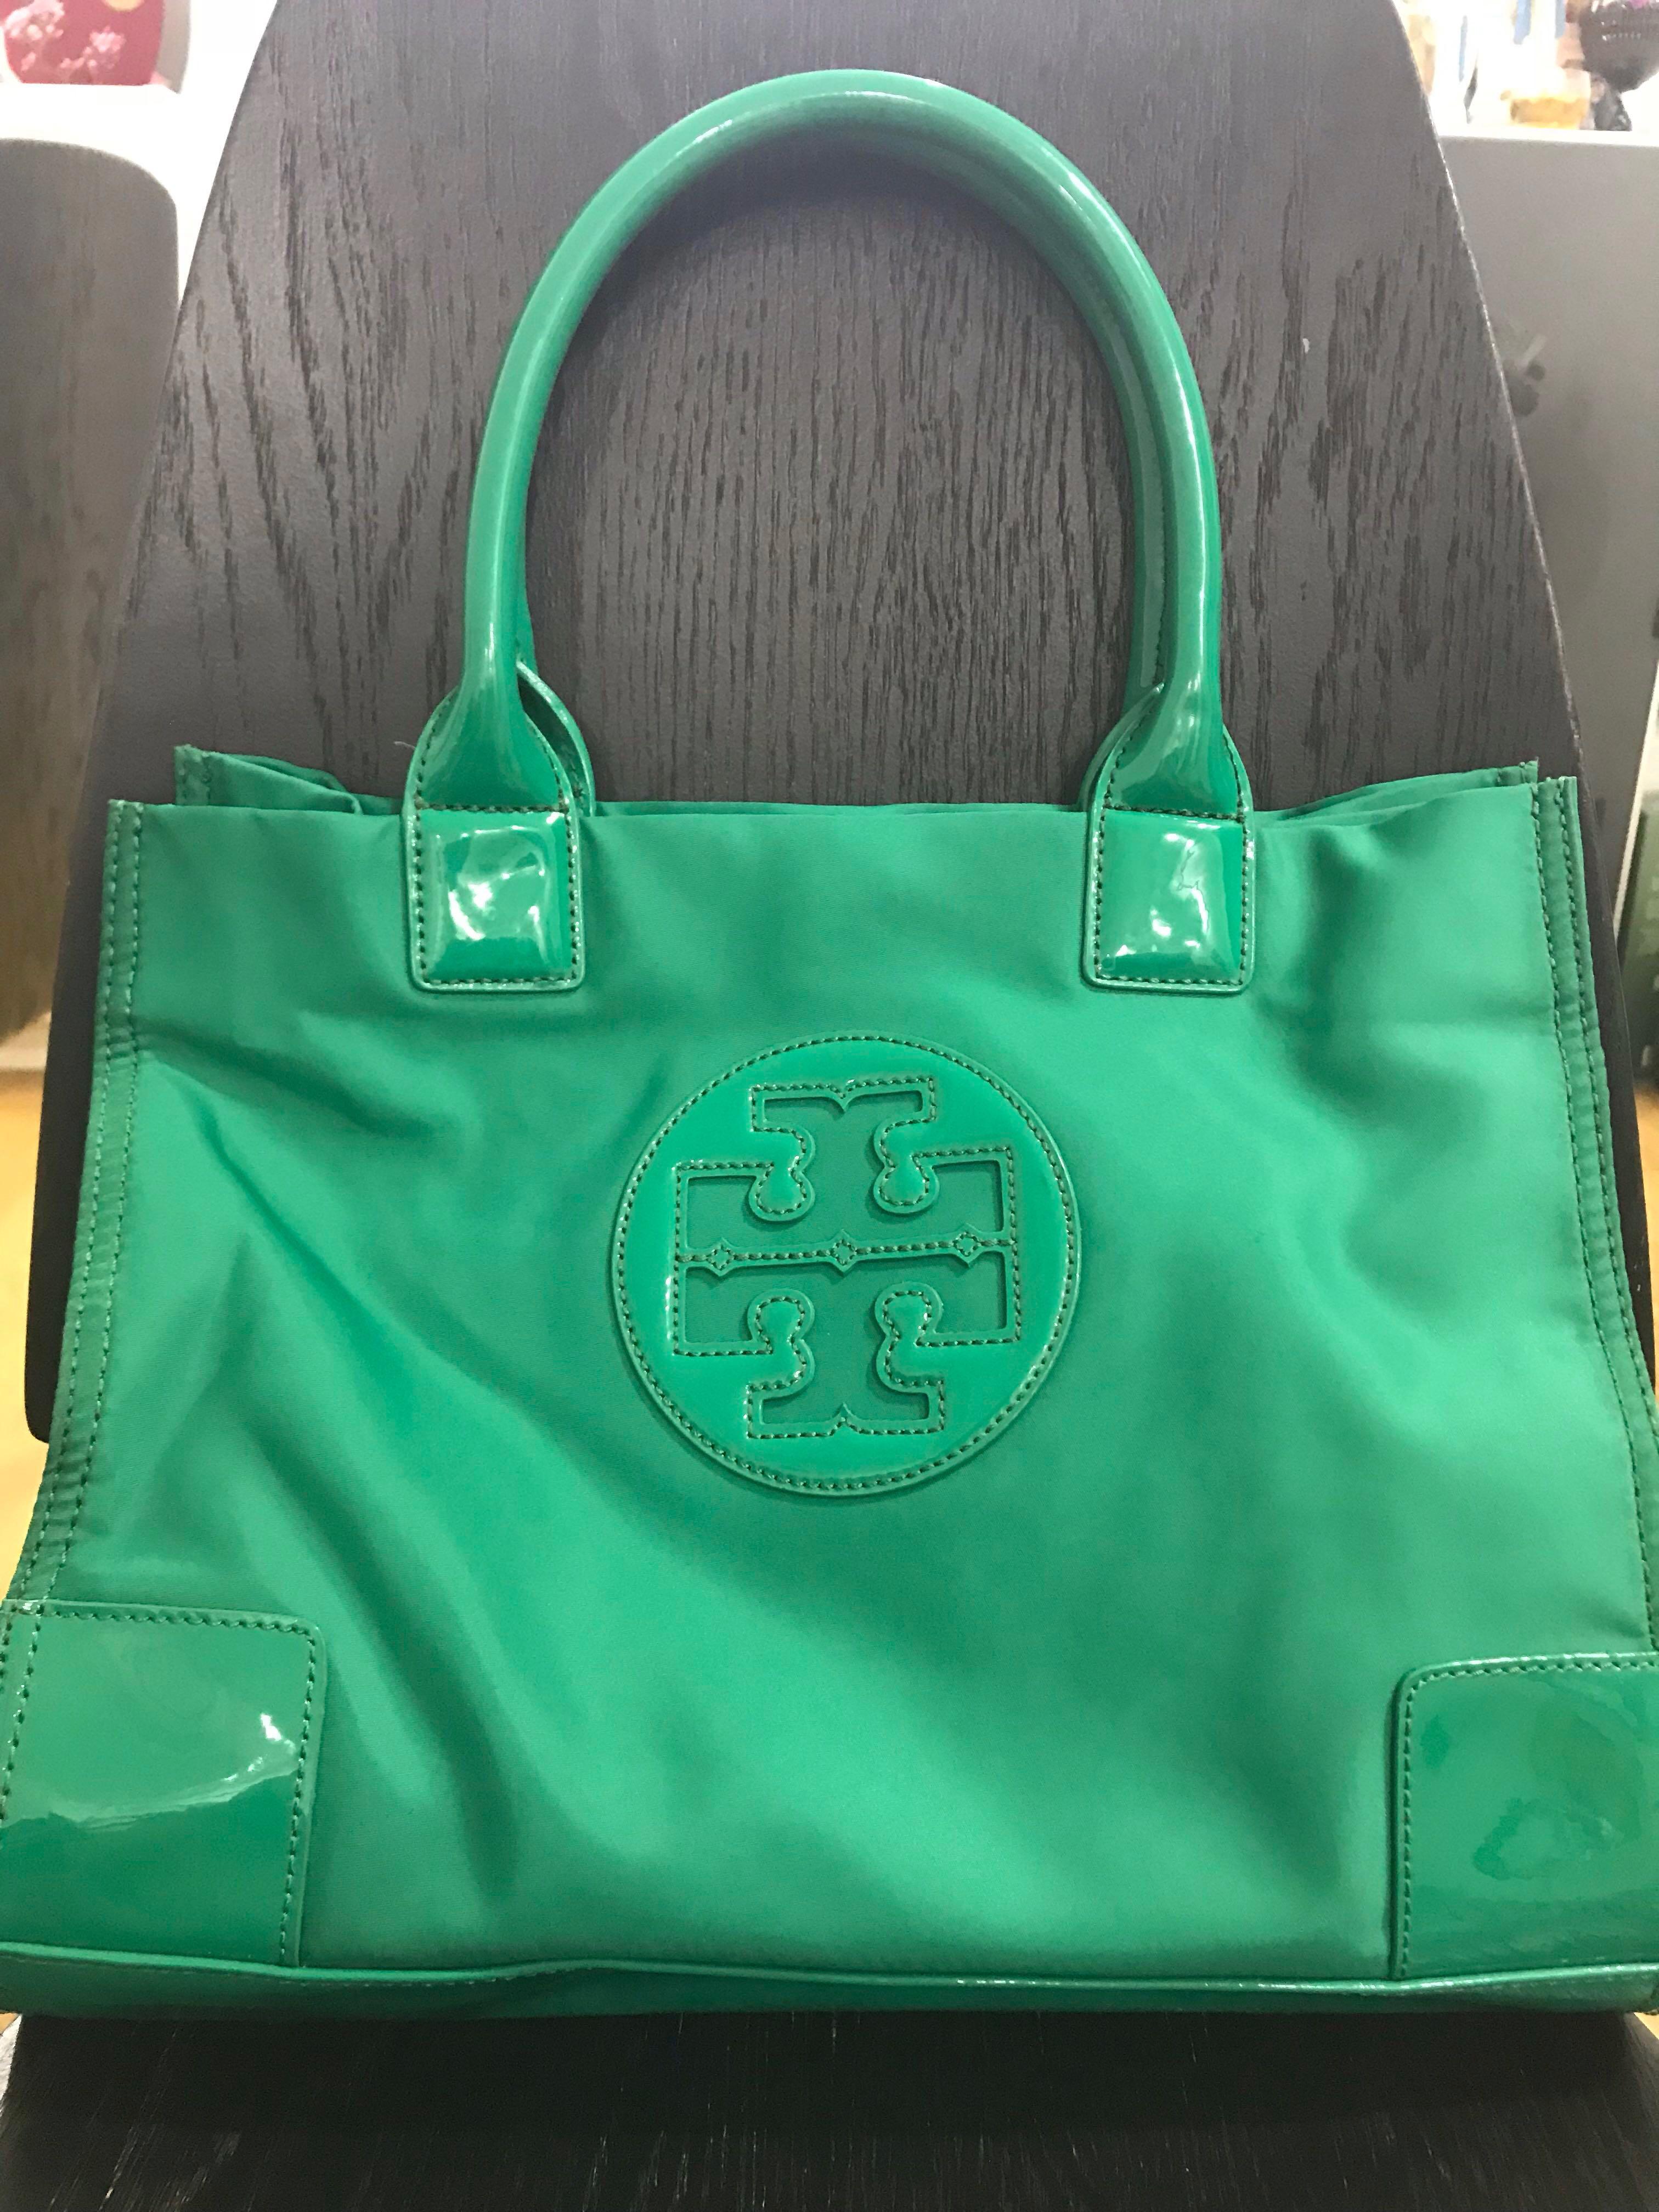 39e8fa48ef0 Preloved Tory Burch Green Tote Bag (Medium)